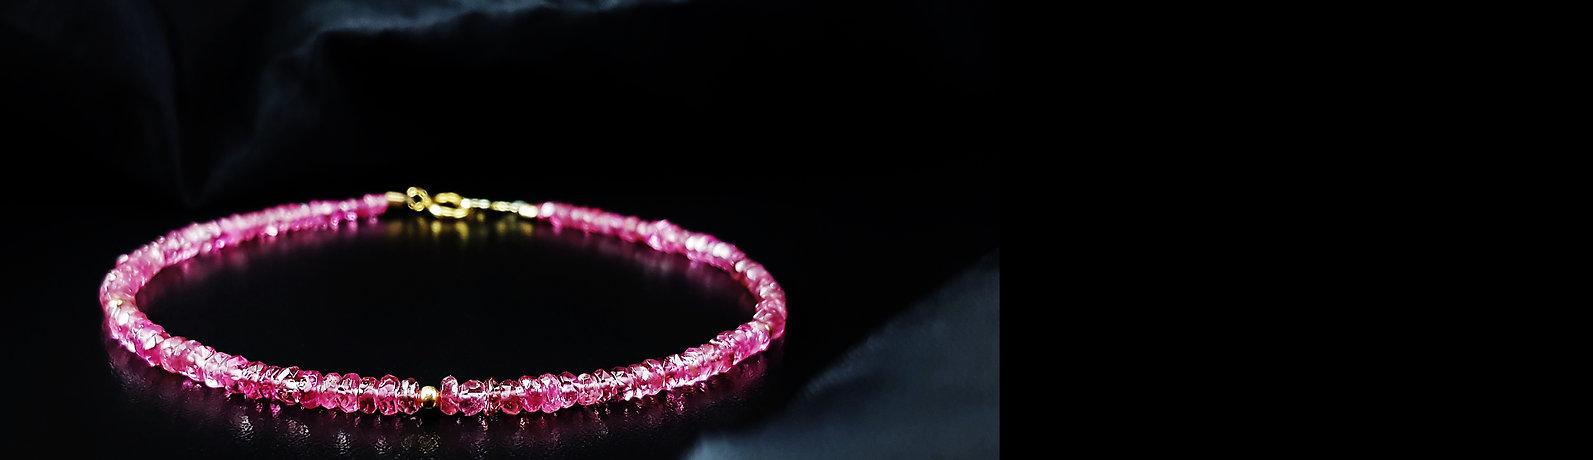 Gemory Bracelets, tourmaline bracelet, pink tourmaline, rubylite tourmaline bracelet, made in germany, dainty bracelet, bracelet for her, precious gems